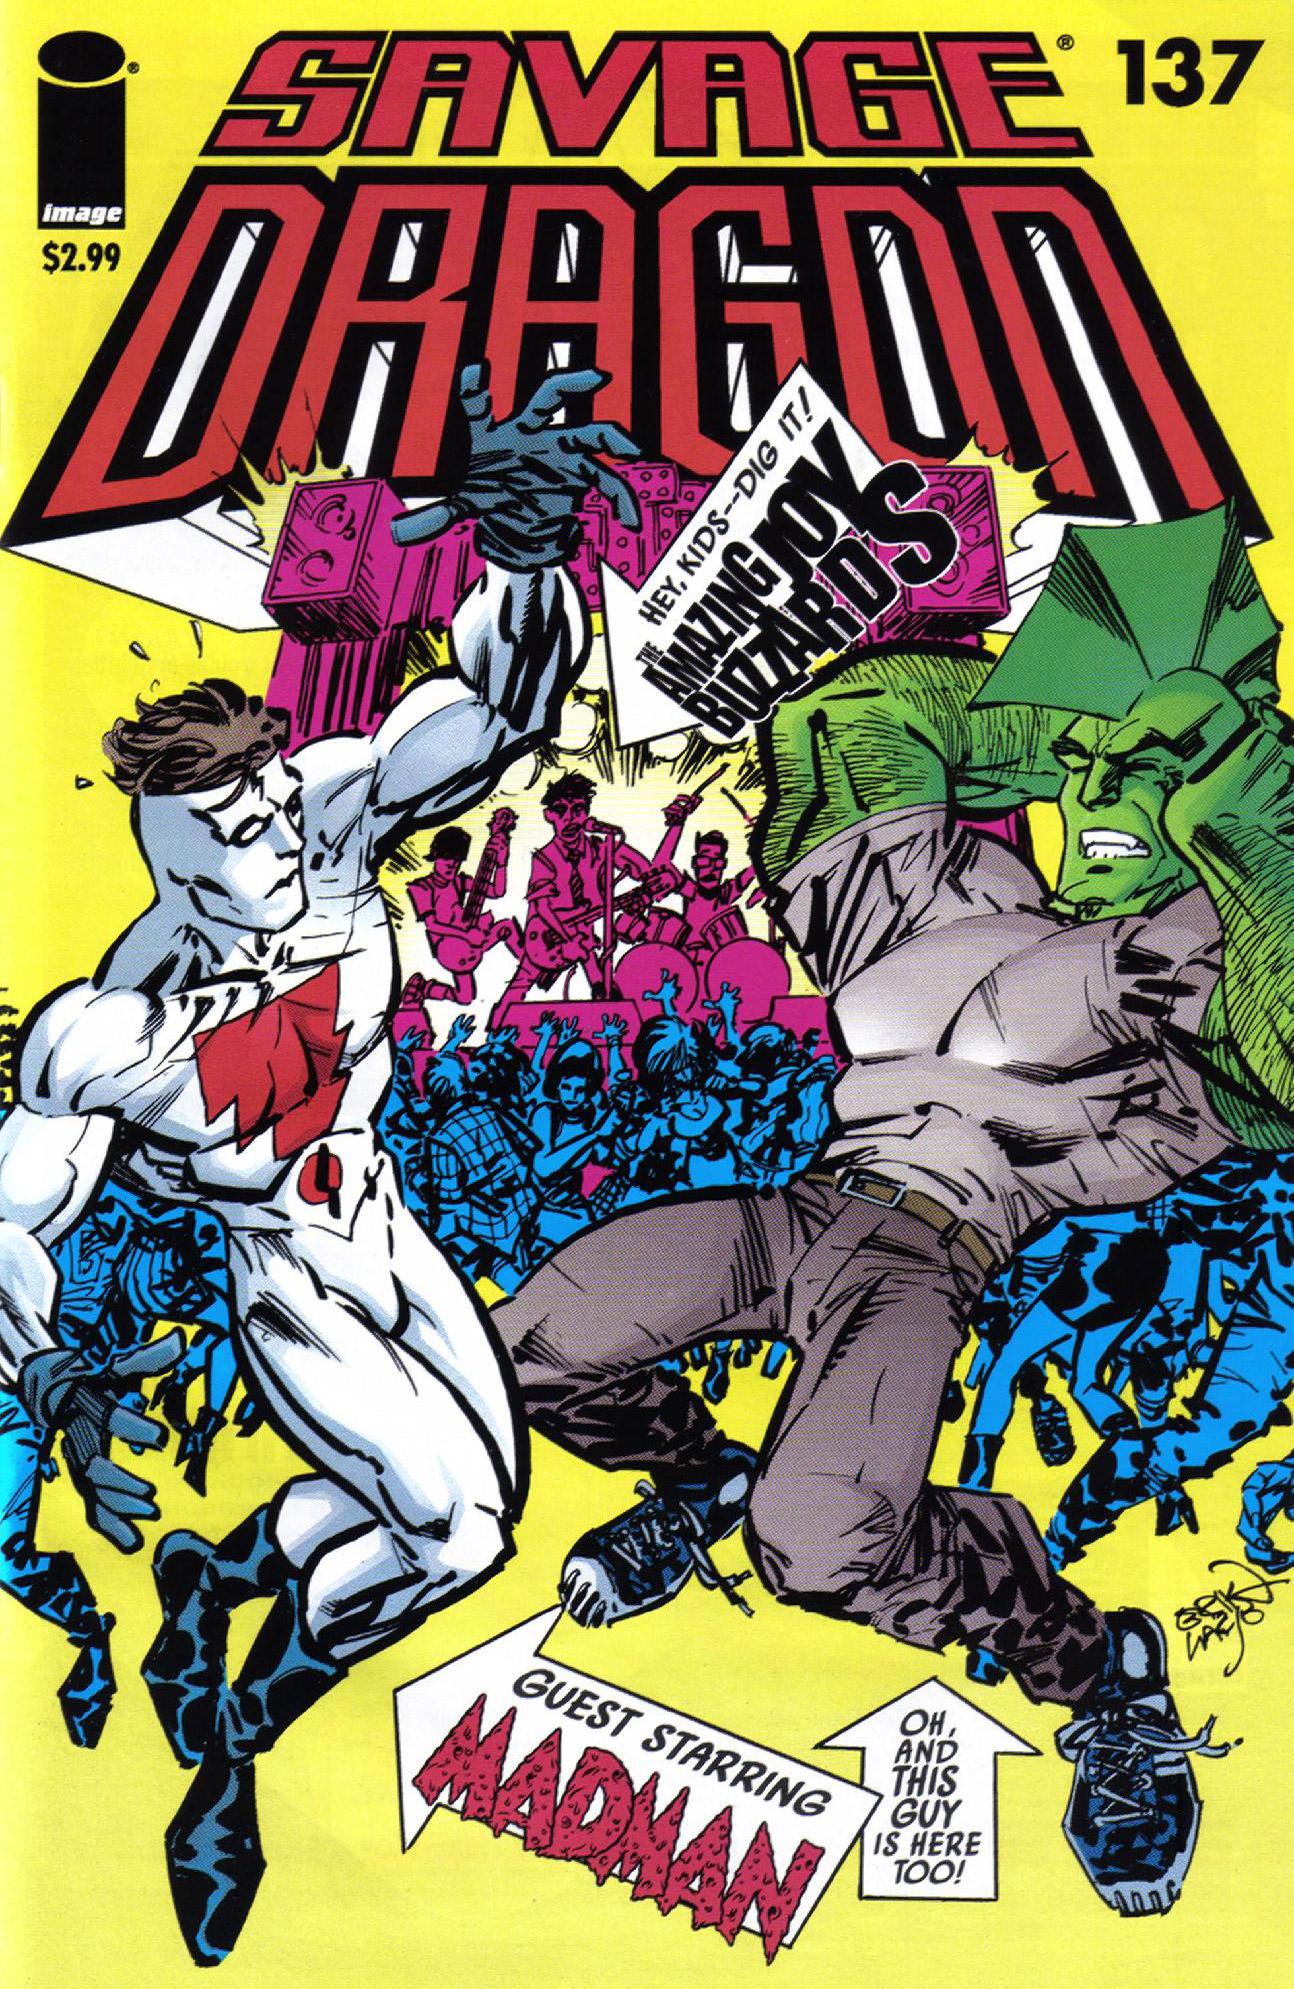 Cover Savage Dragon Vol.2 #137